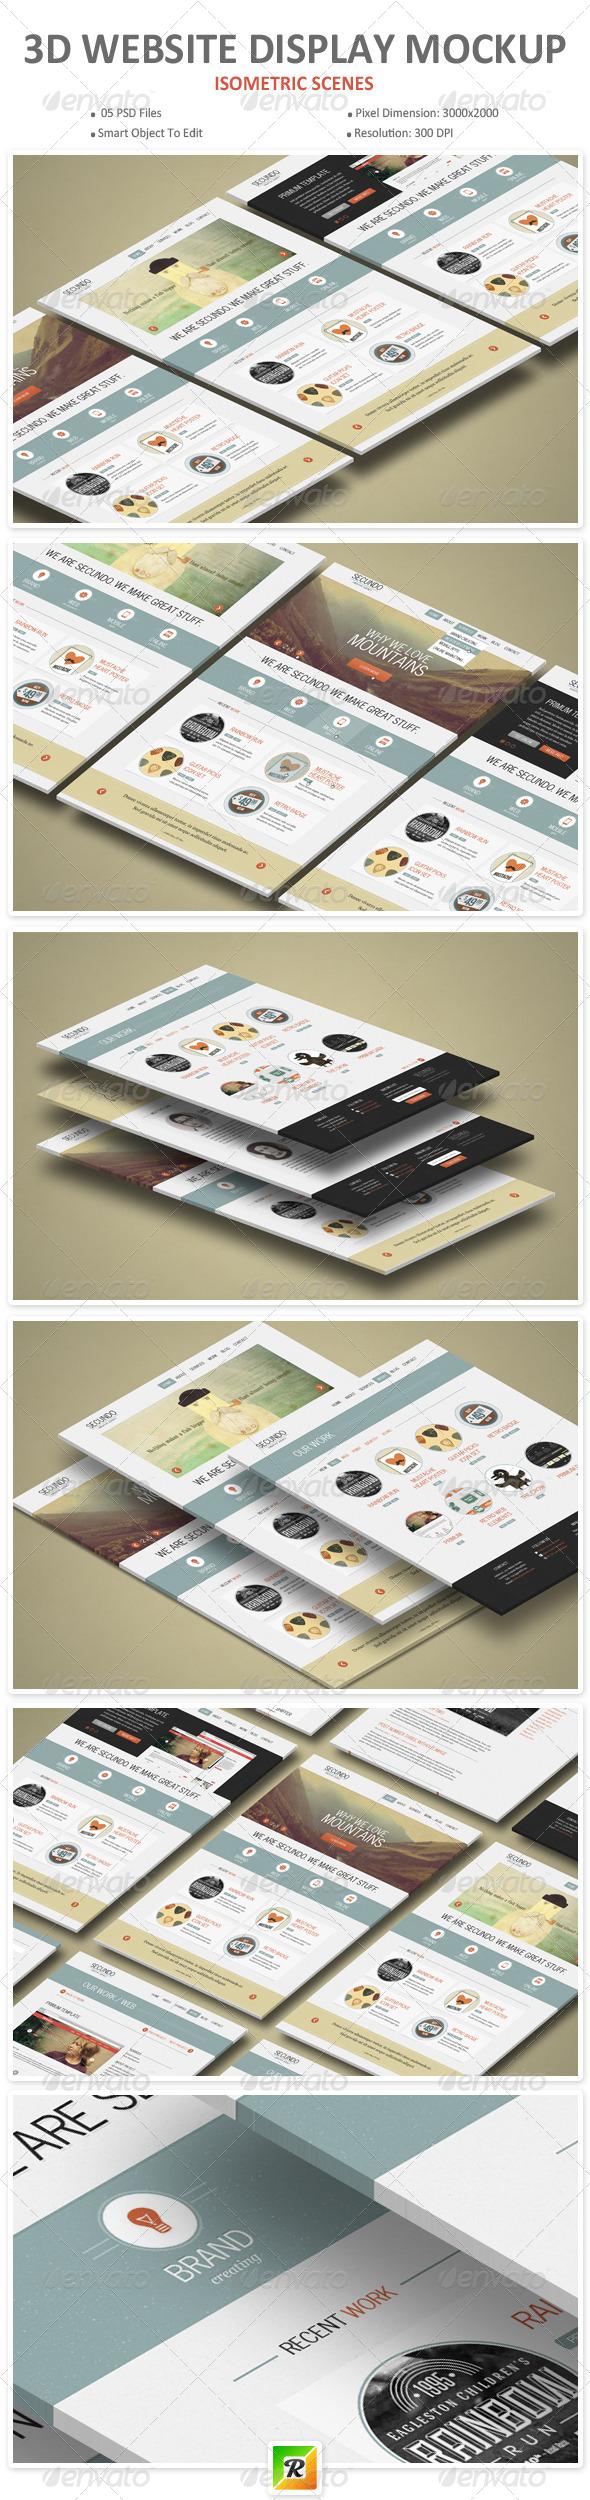 GraphicRiver 3D Website Display Mockup 8284786